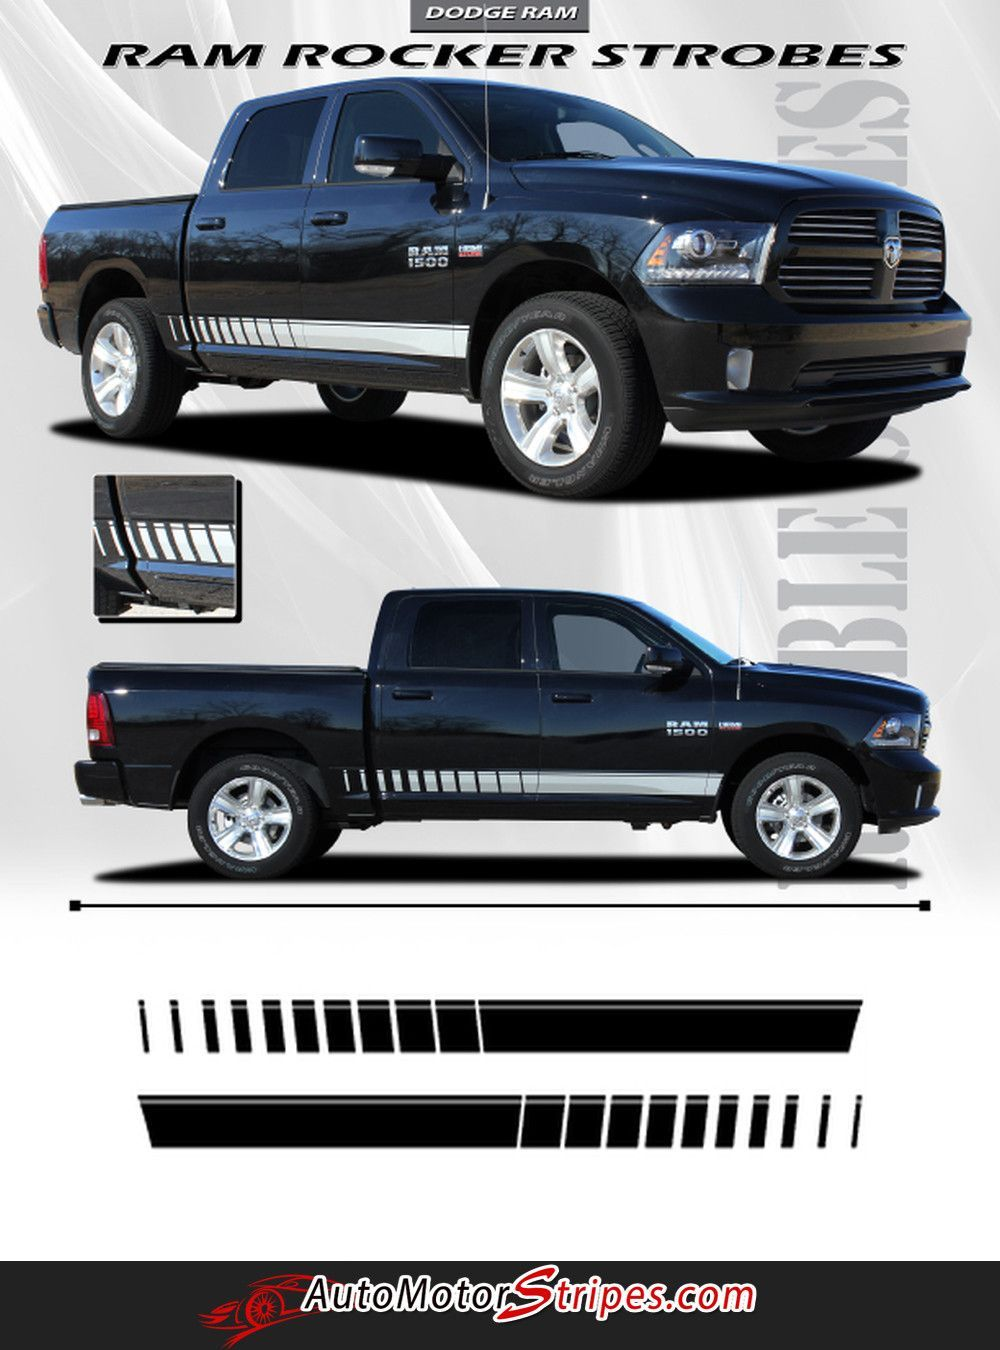 medium resolution of vehicle specific style dodge ram truck lower rocker panel strobe vinyl graphic stripe decals year fitment 2009 2010 2011 2012 2013 2014 2015 2016 contents